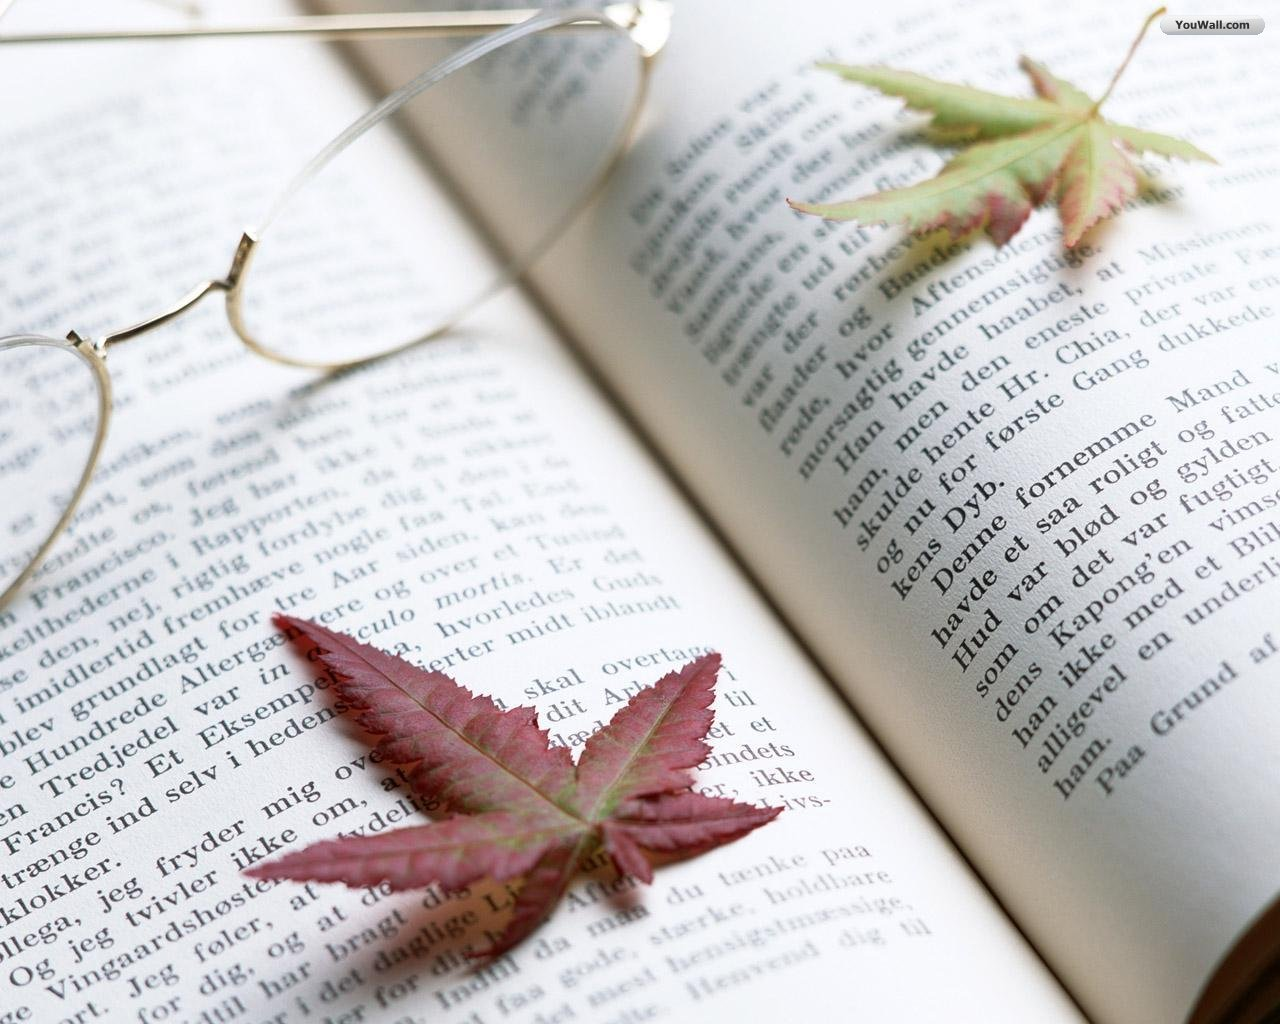 http://1.bp.blogspot.com/-q9kfY-TEfqs/Tq1Pc6A9joI/AAAAAAAABCY/cXRhQ2Drpnk/s1600/leaves_over_the_book_wallpaper_e73ad.jpg